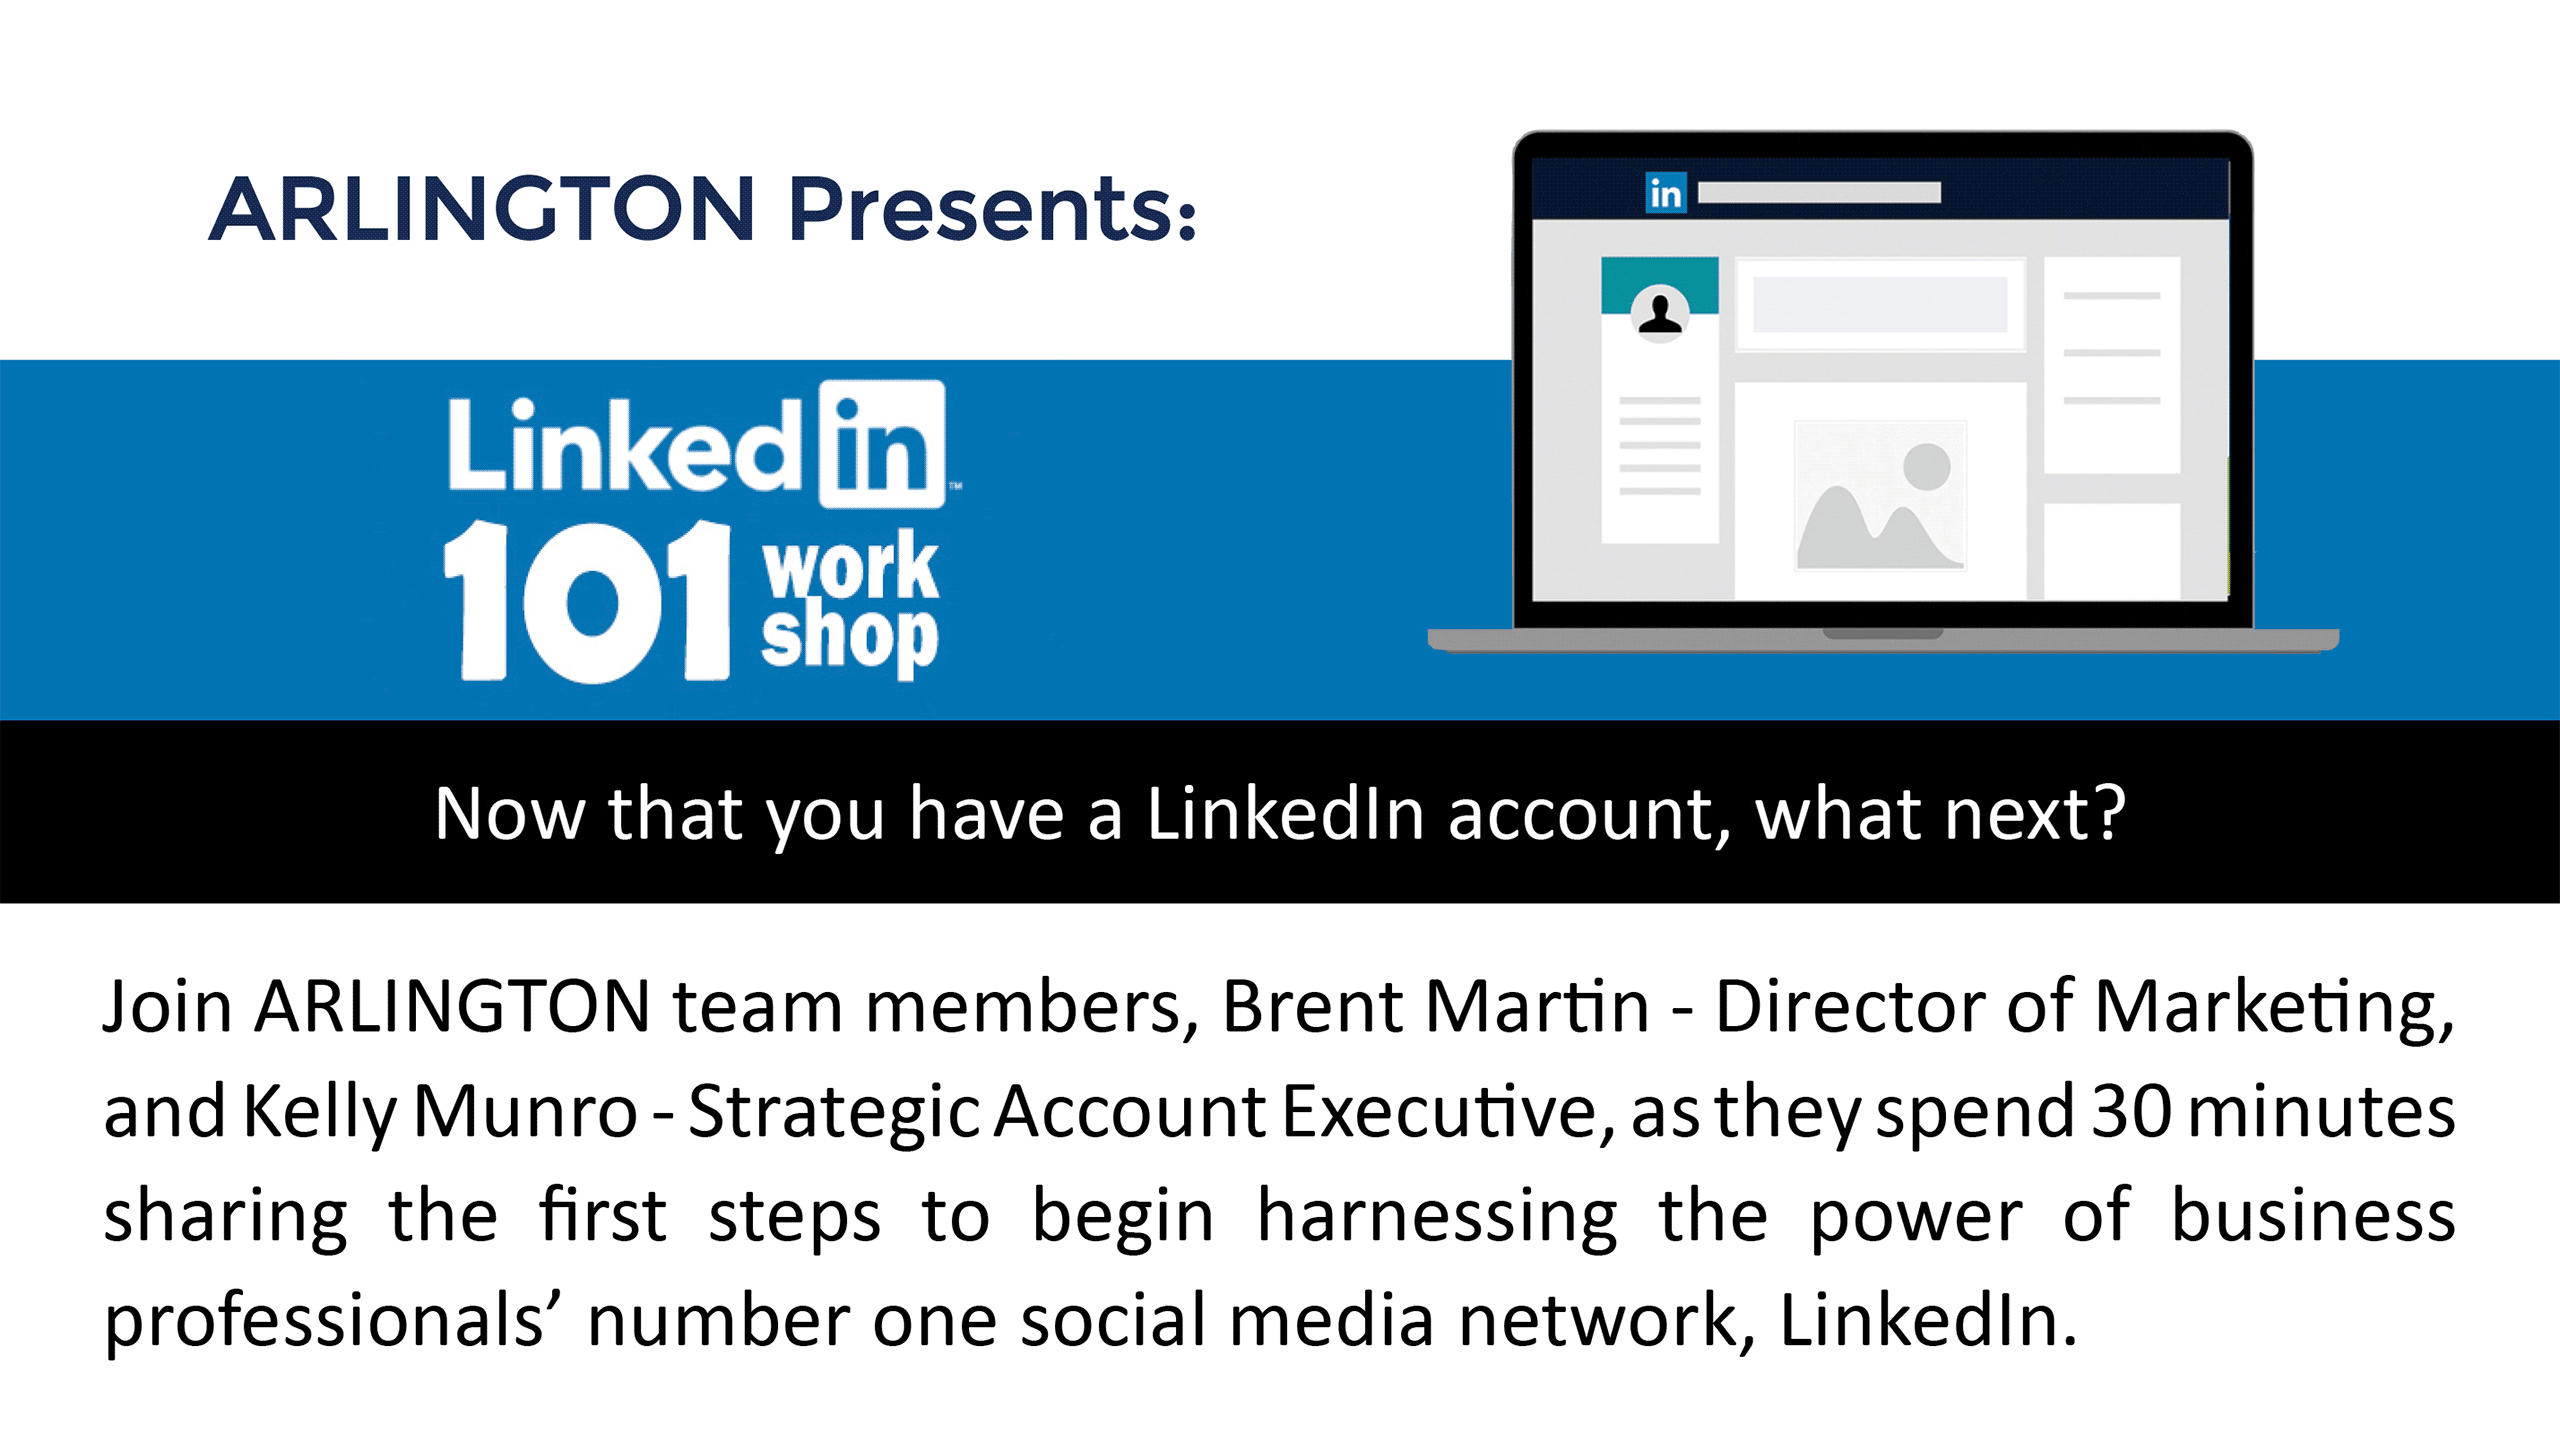 LinkedIn 101 Work Shop